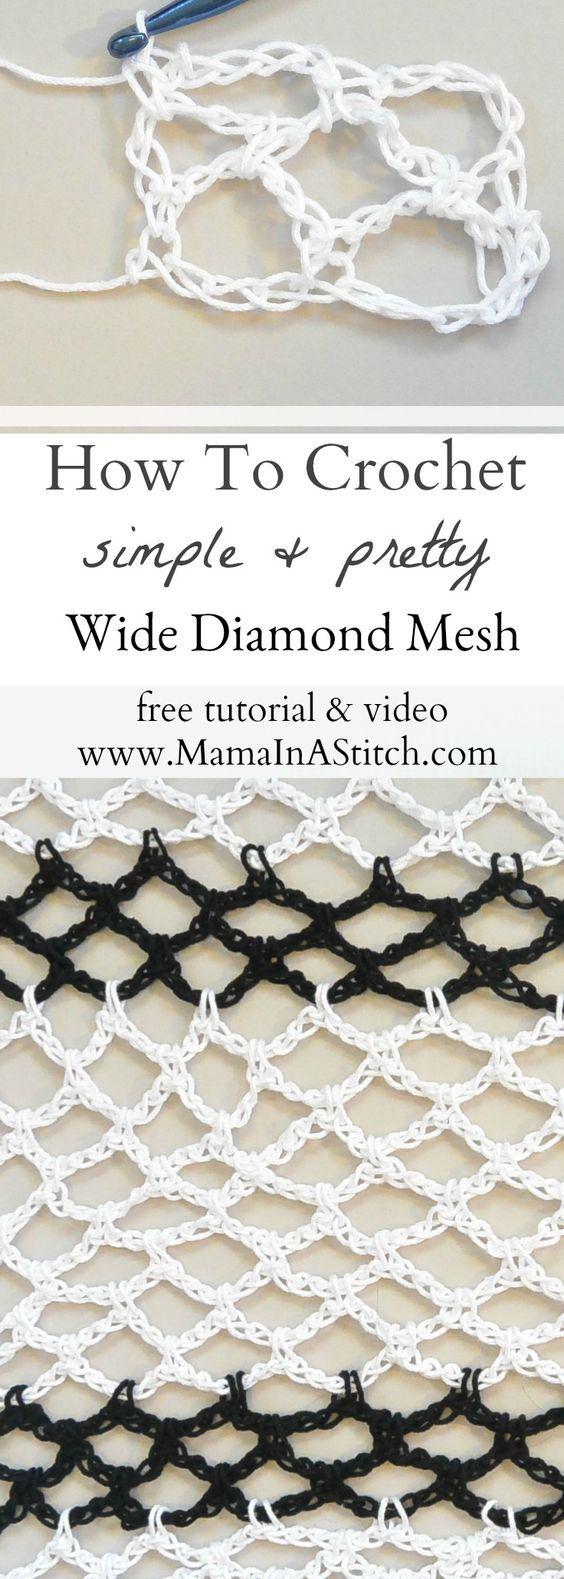 How To Crochet Diamond Mesh Stitch | Puntadas y Ganchillo